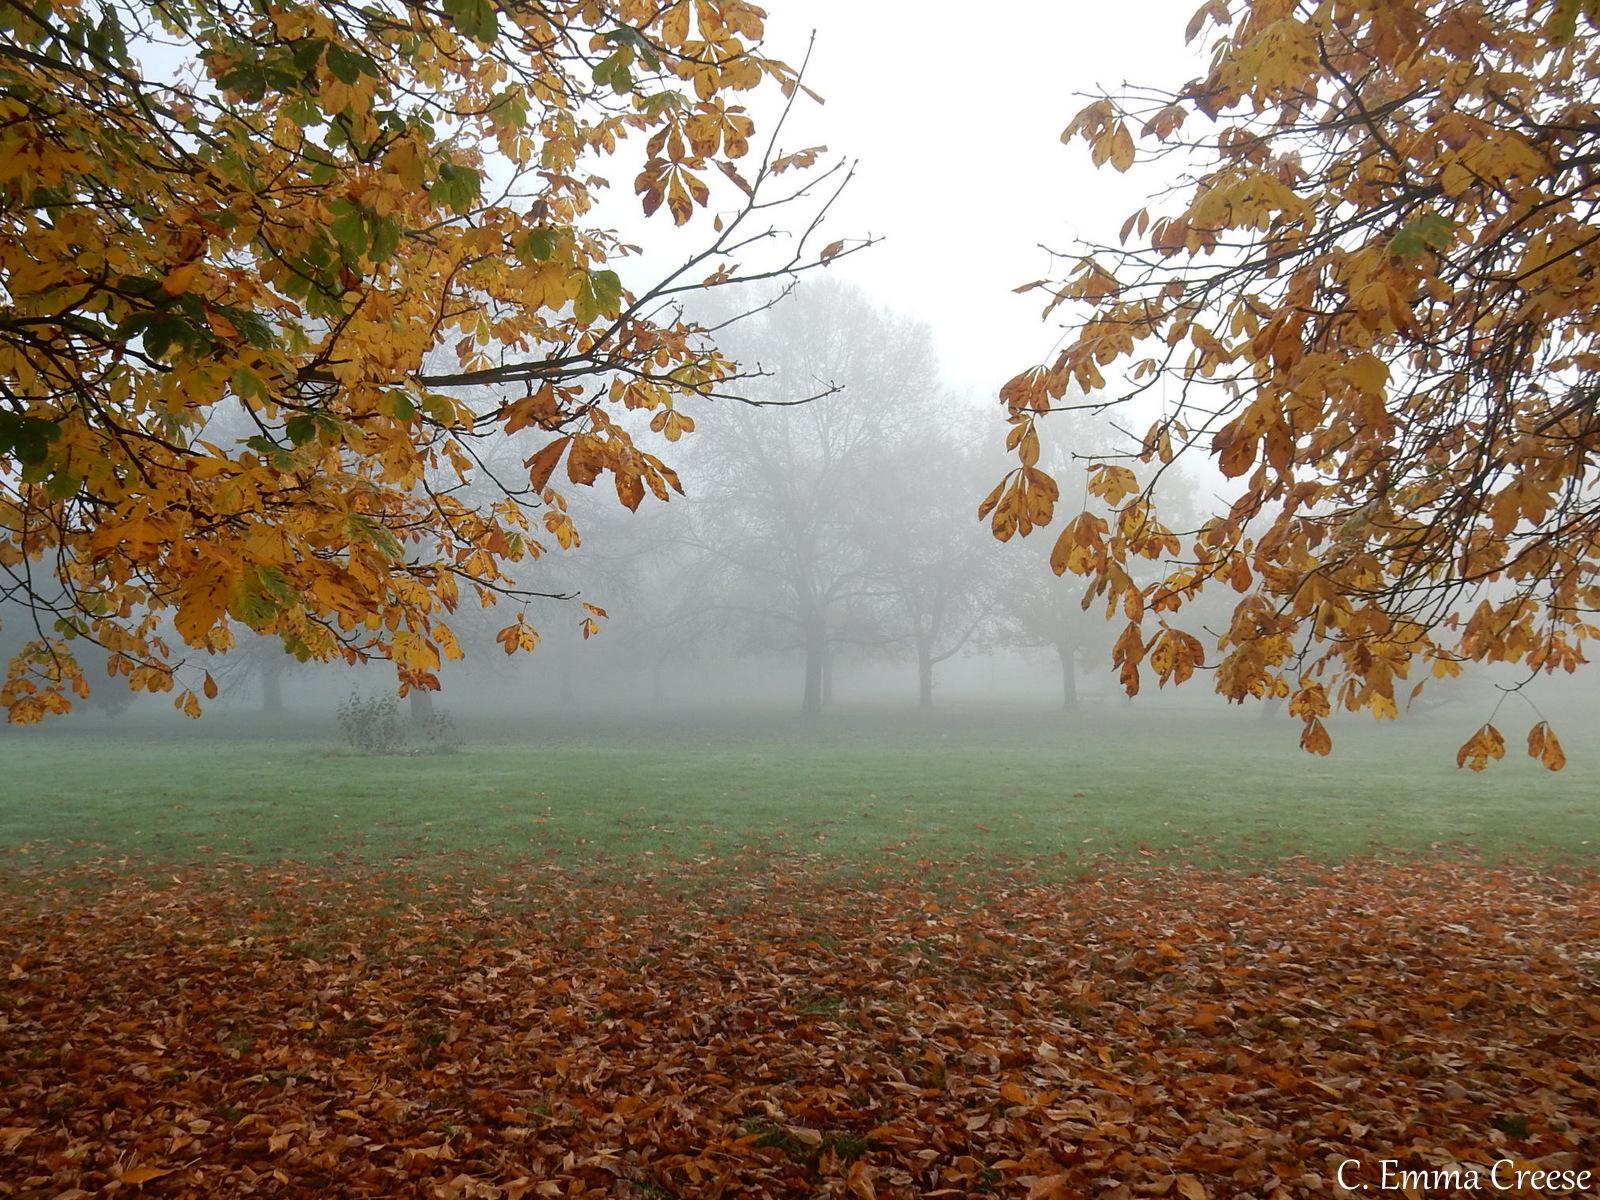 Autumn Leaves London Fog Adventures of a London Kiwi